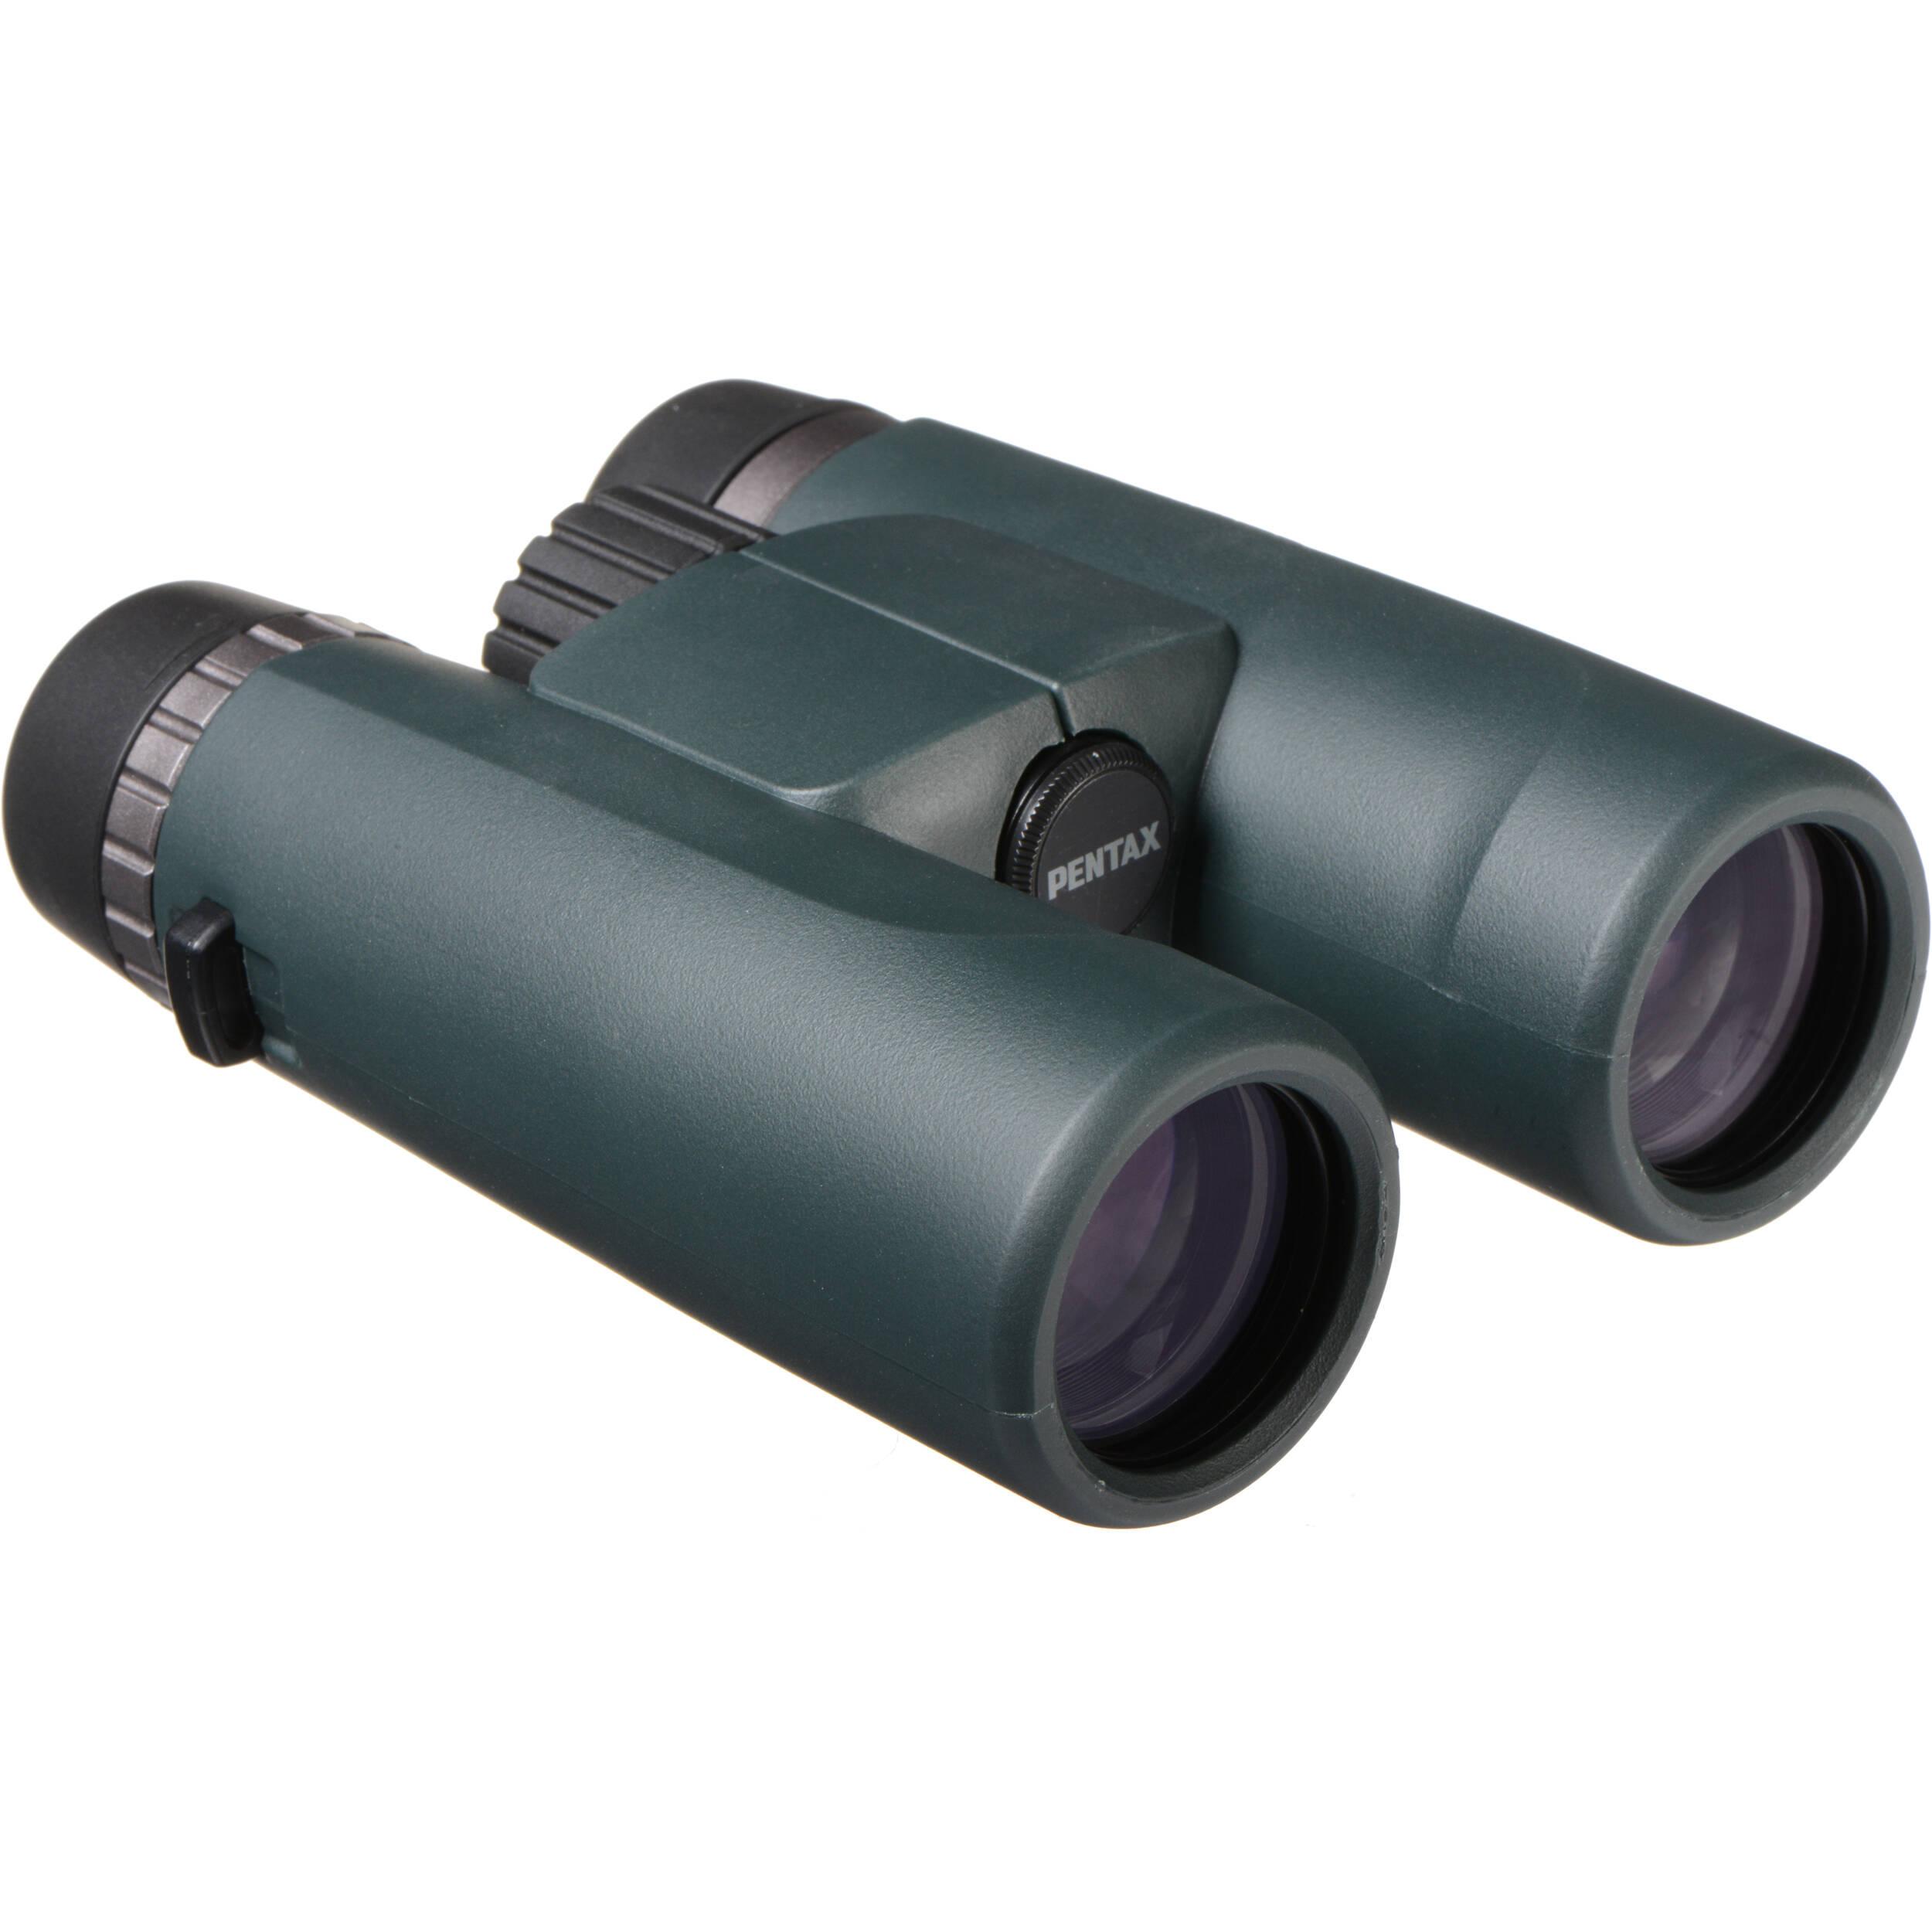 pentax 8x36 a series ad wp compact binocular 62851 b h photo rh bhphotovideo com Pentax UCF II Pentax 62217 UCF II 8 16X21 Zoom Binocular